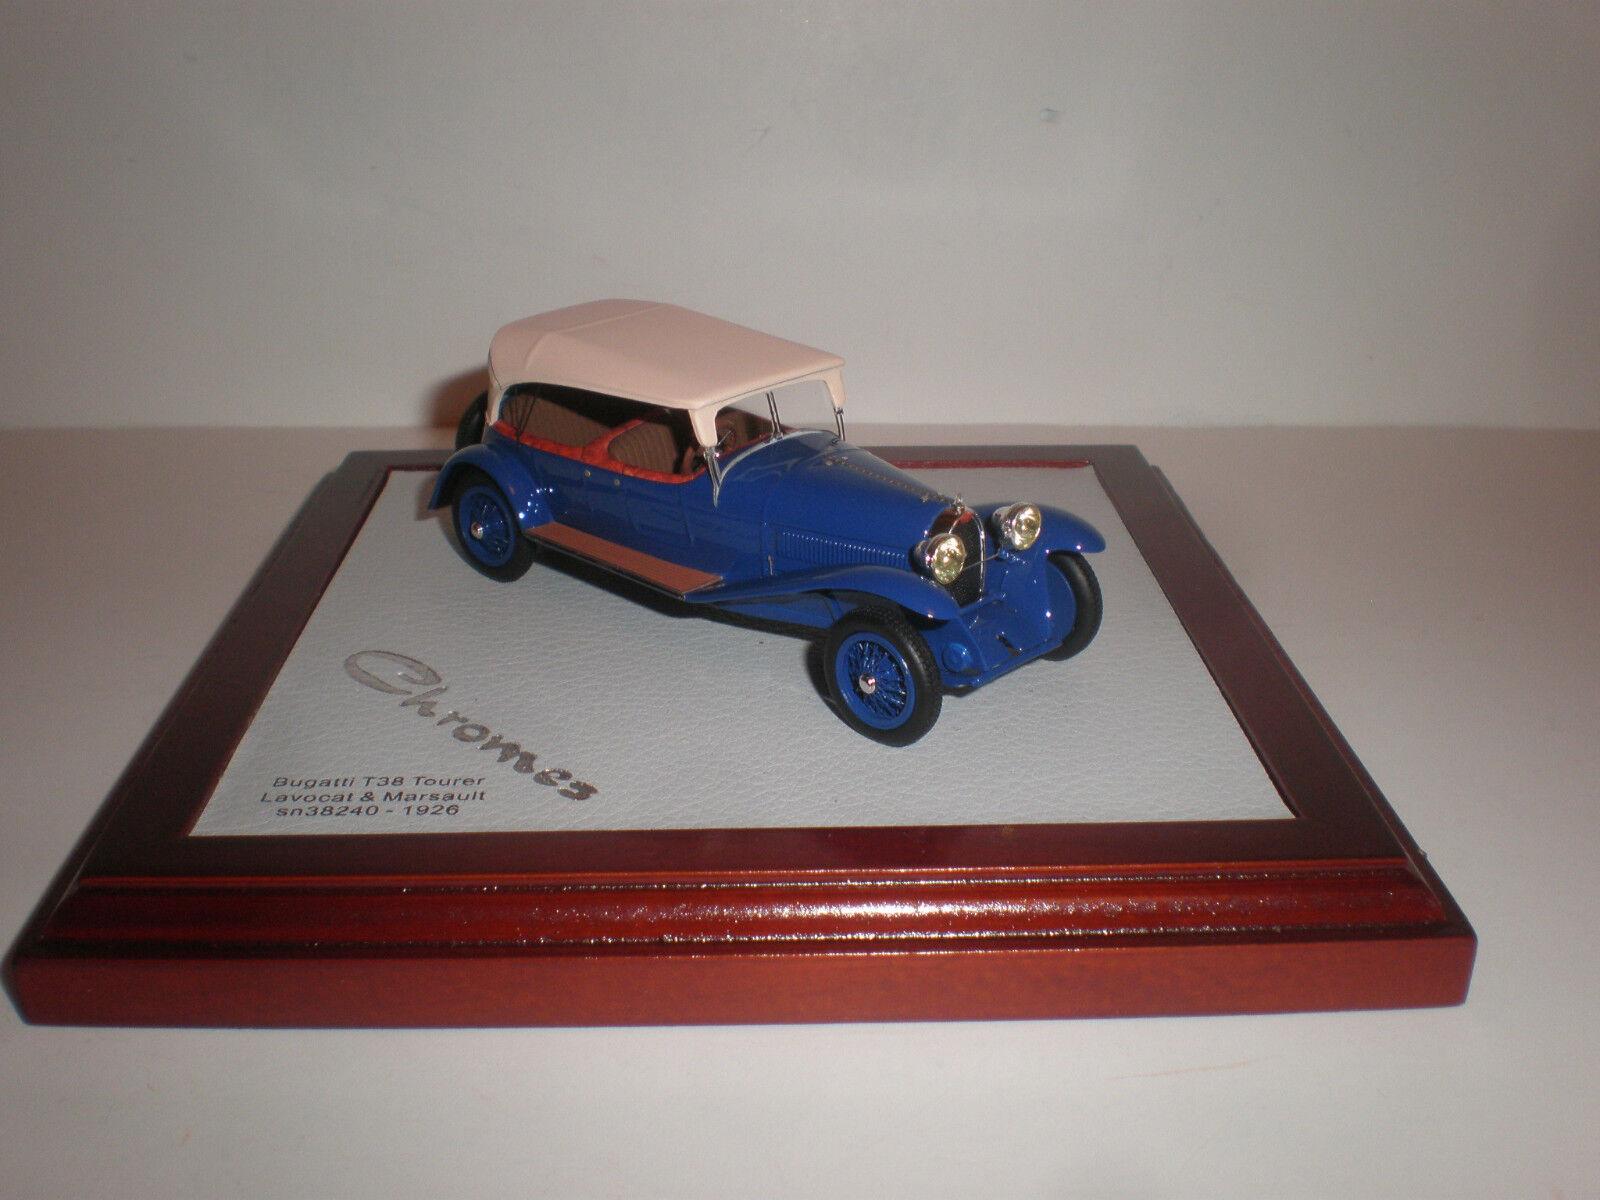 nuevo sádico 1 43 Ilario Ilario Ilario 1926 Bugatti Tipo 38 Tourer Lavocat & marsault Cerrado Chro 036  perfecto